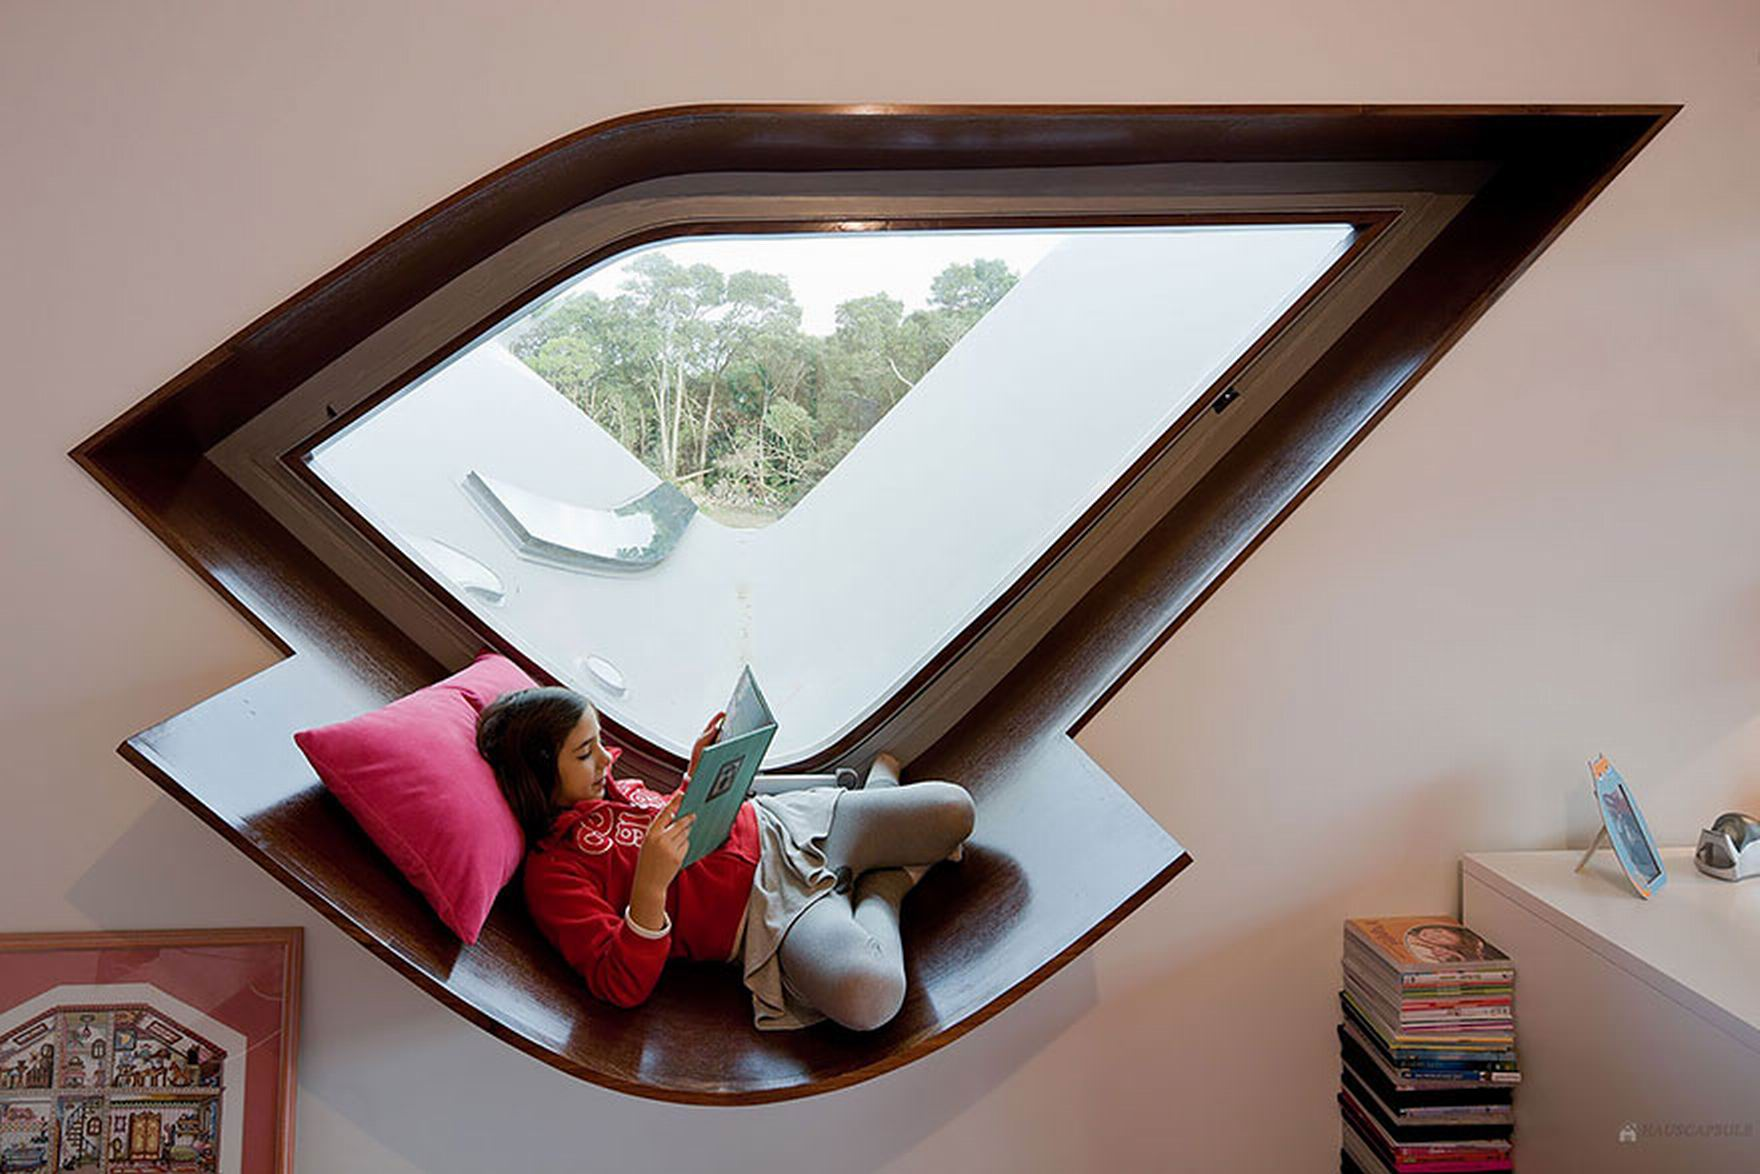 место для отдыха в доме